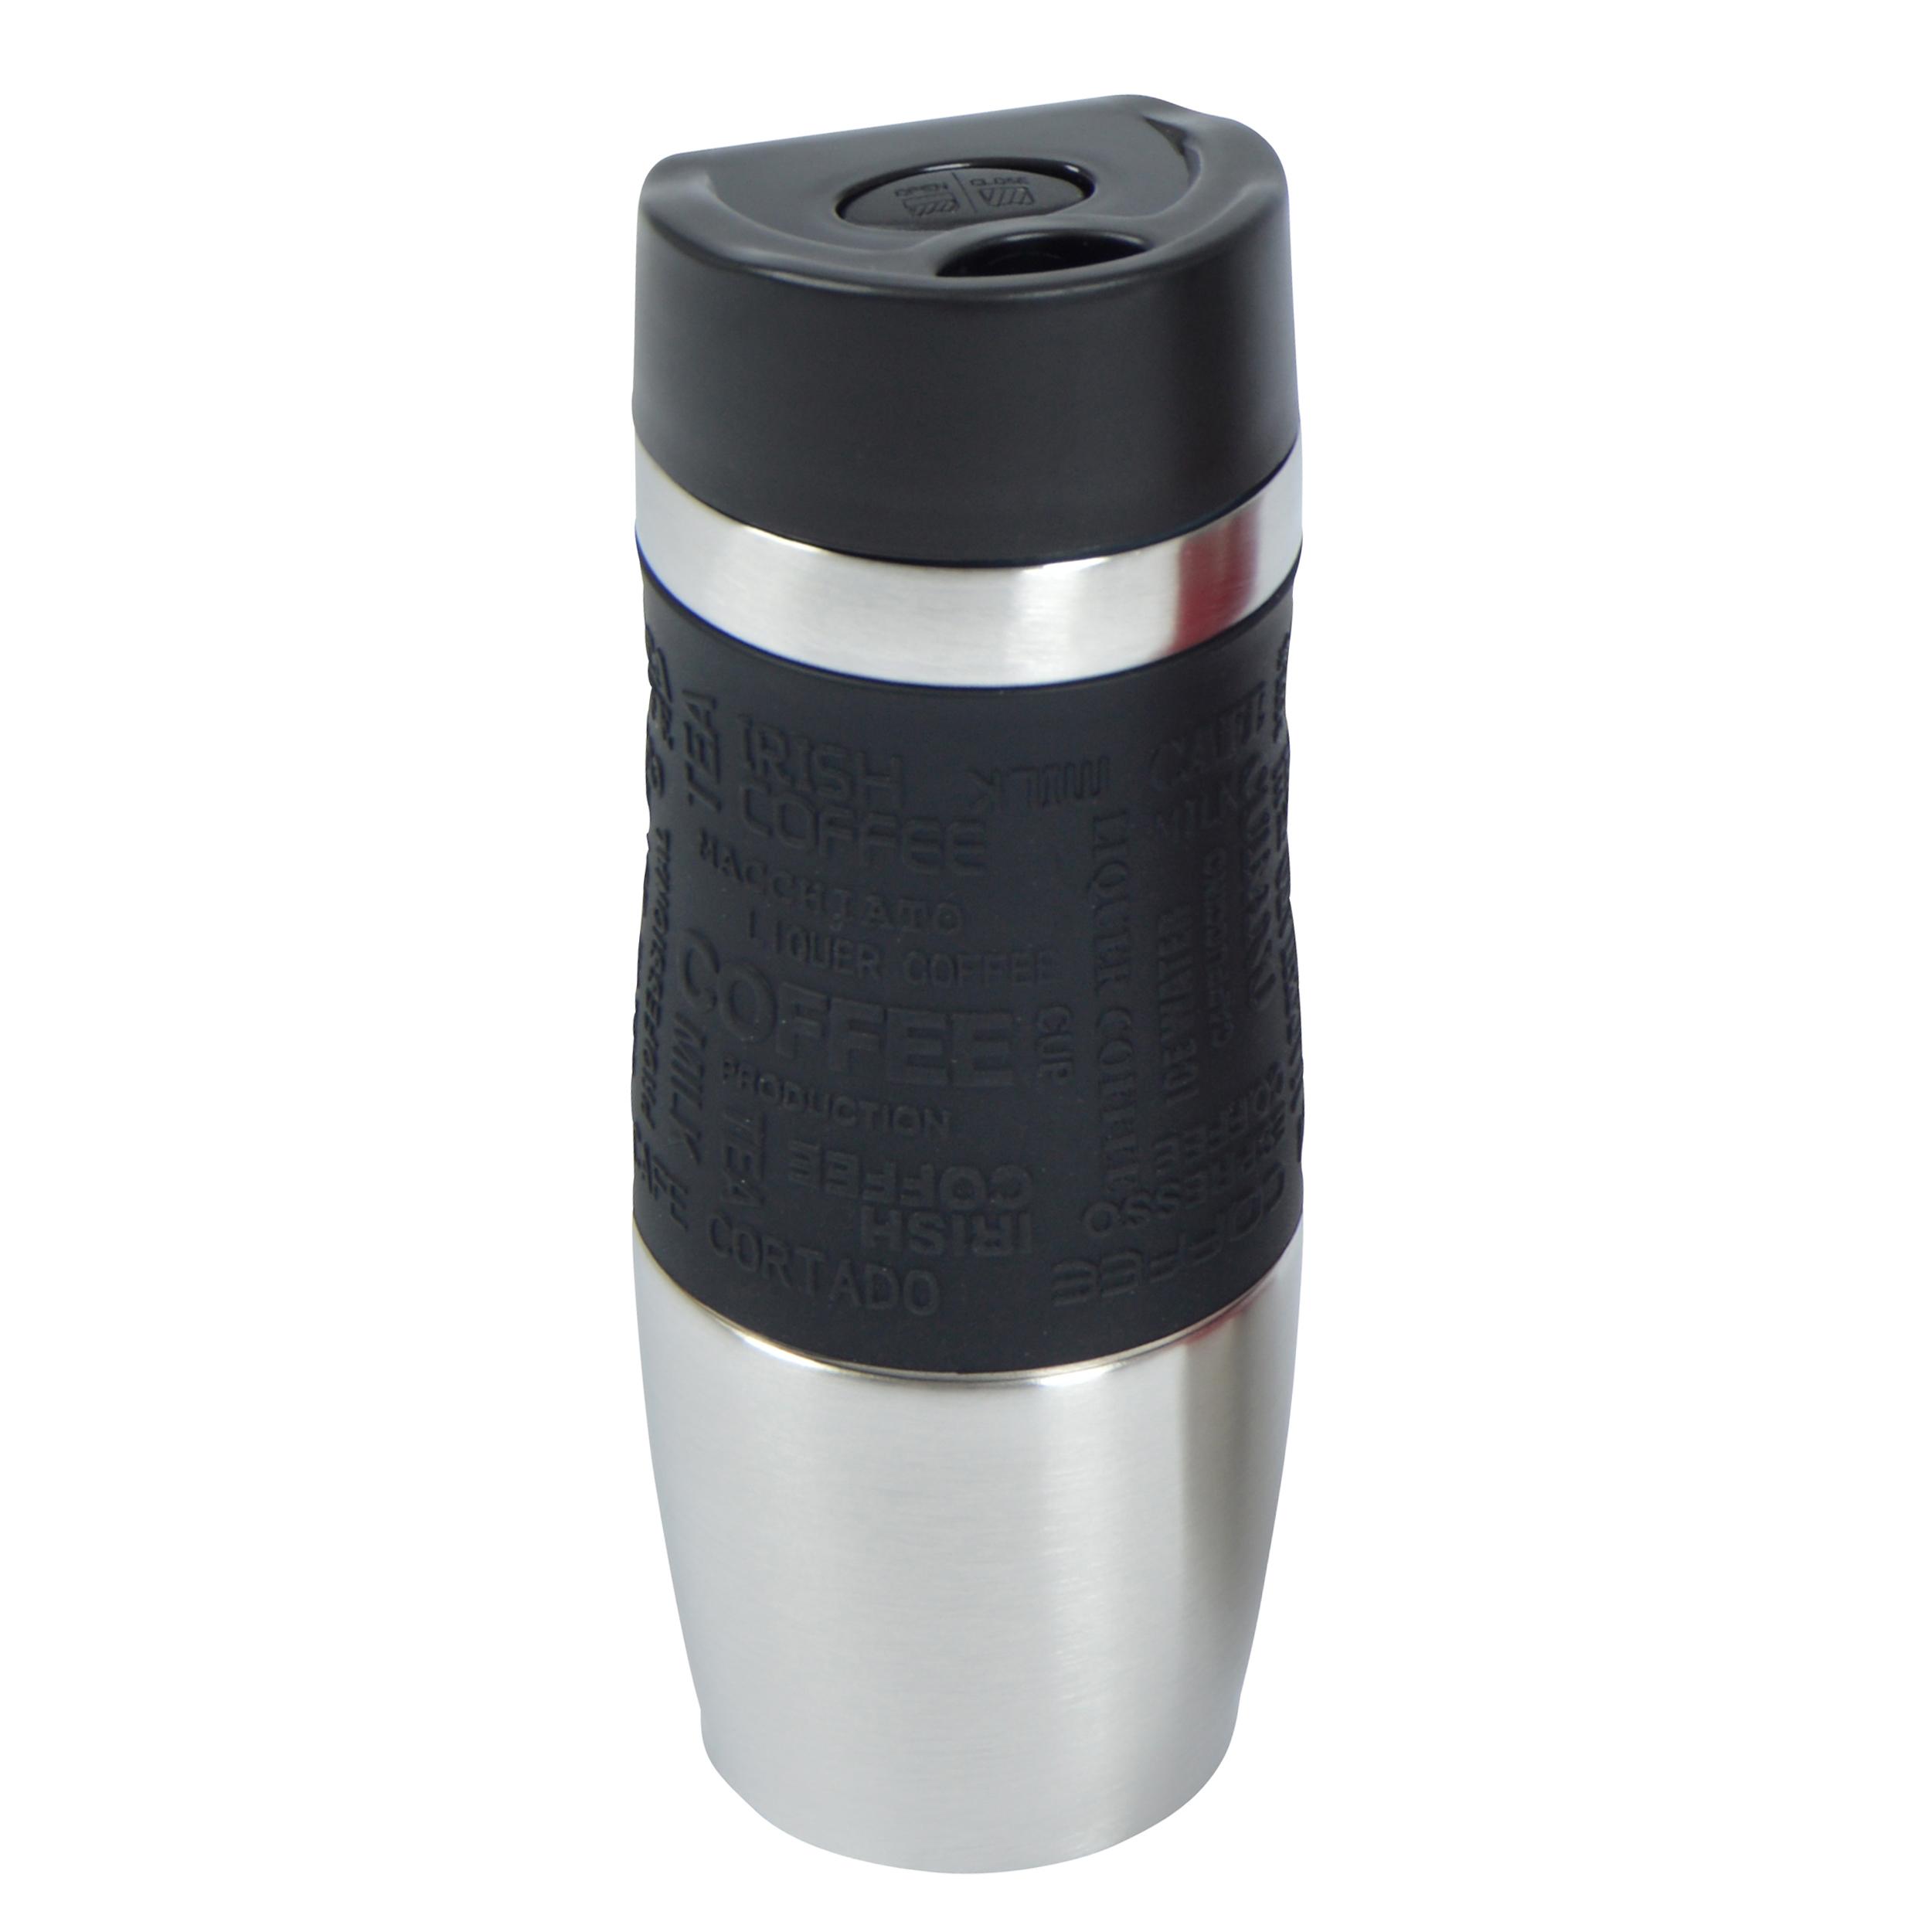 Ocean5 Coffee to go Isolierbecher SV784 Farbe: schwarz